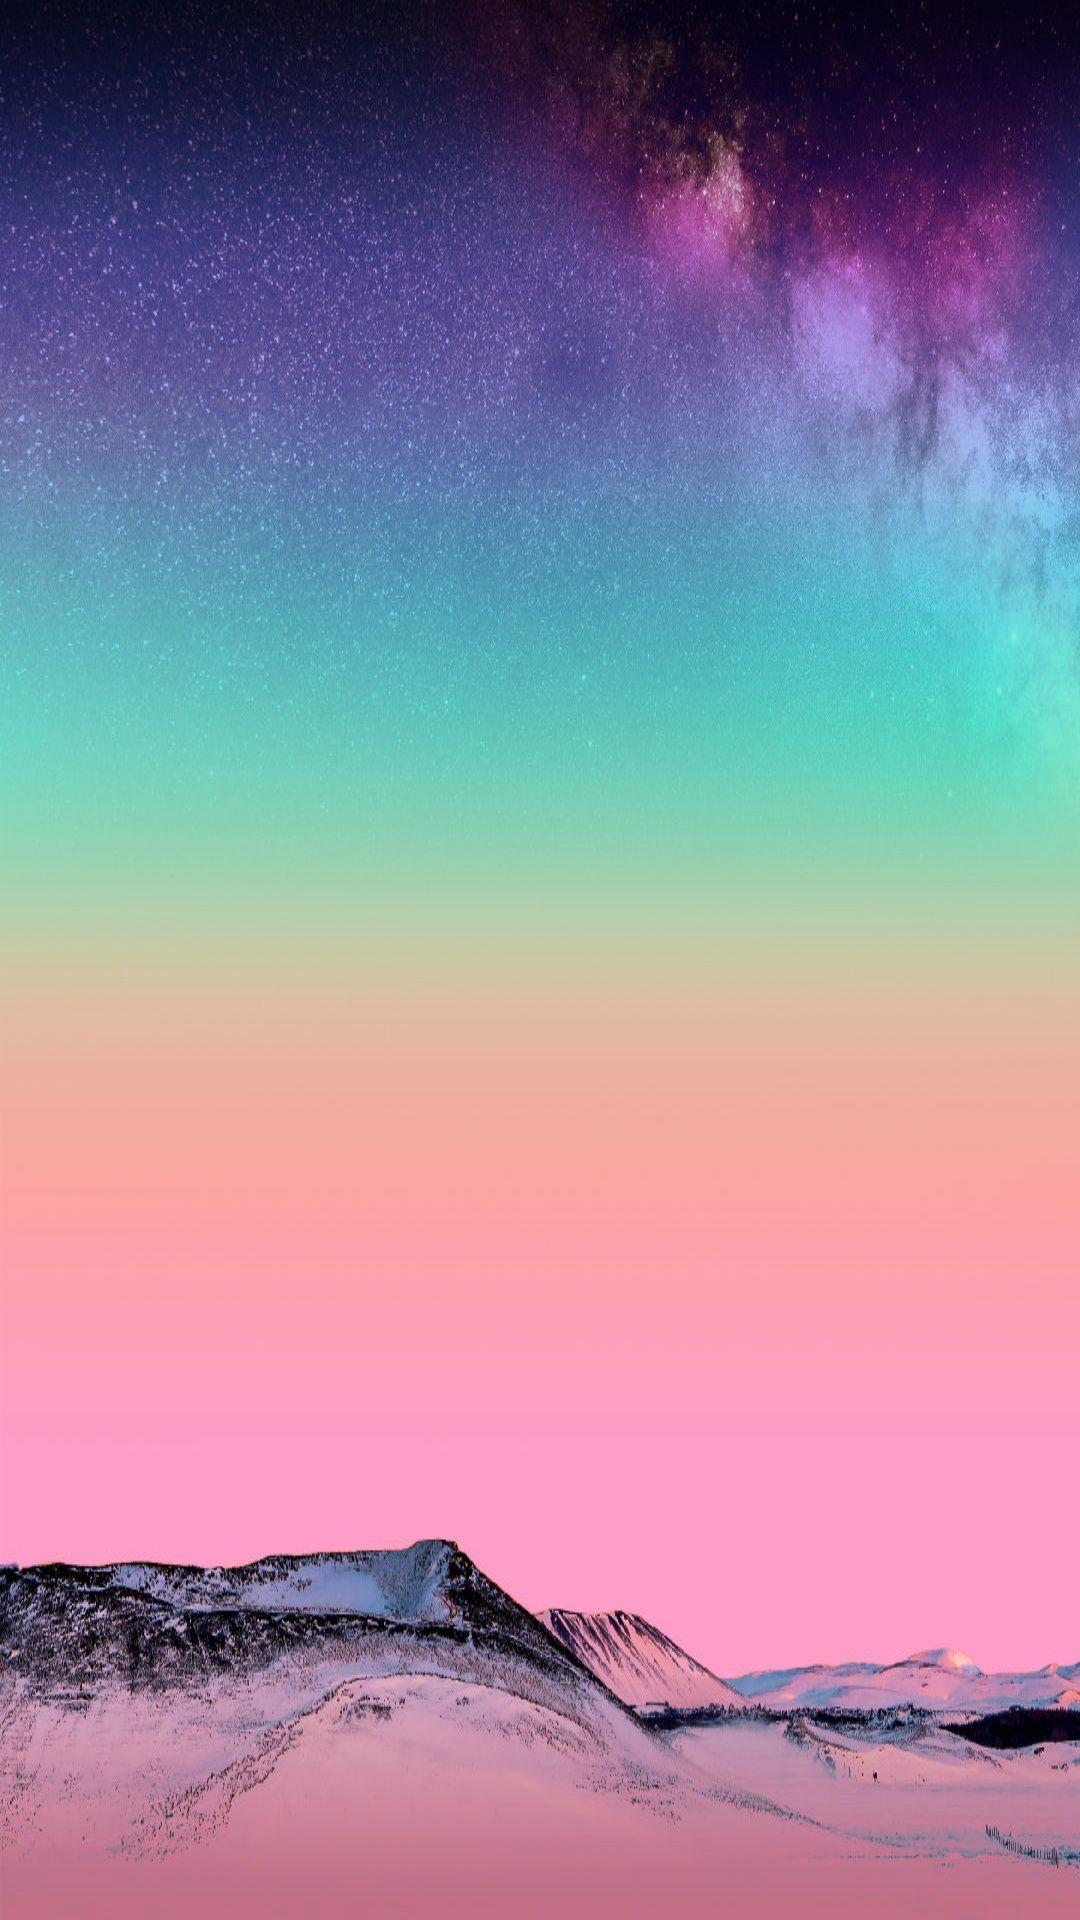 Samsung Galaxy M30 Wallpapers - Wallpaper Cave